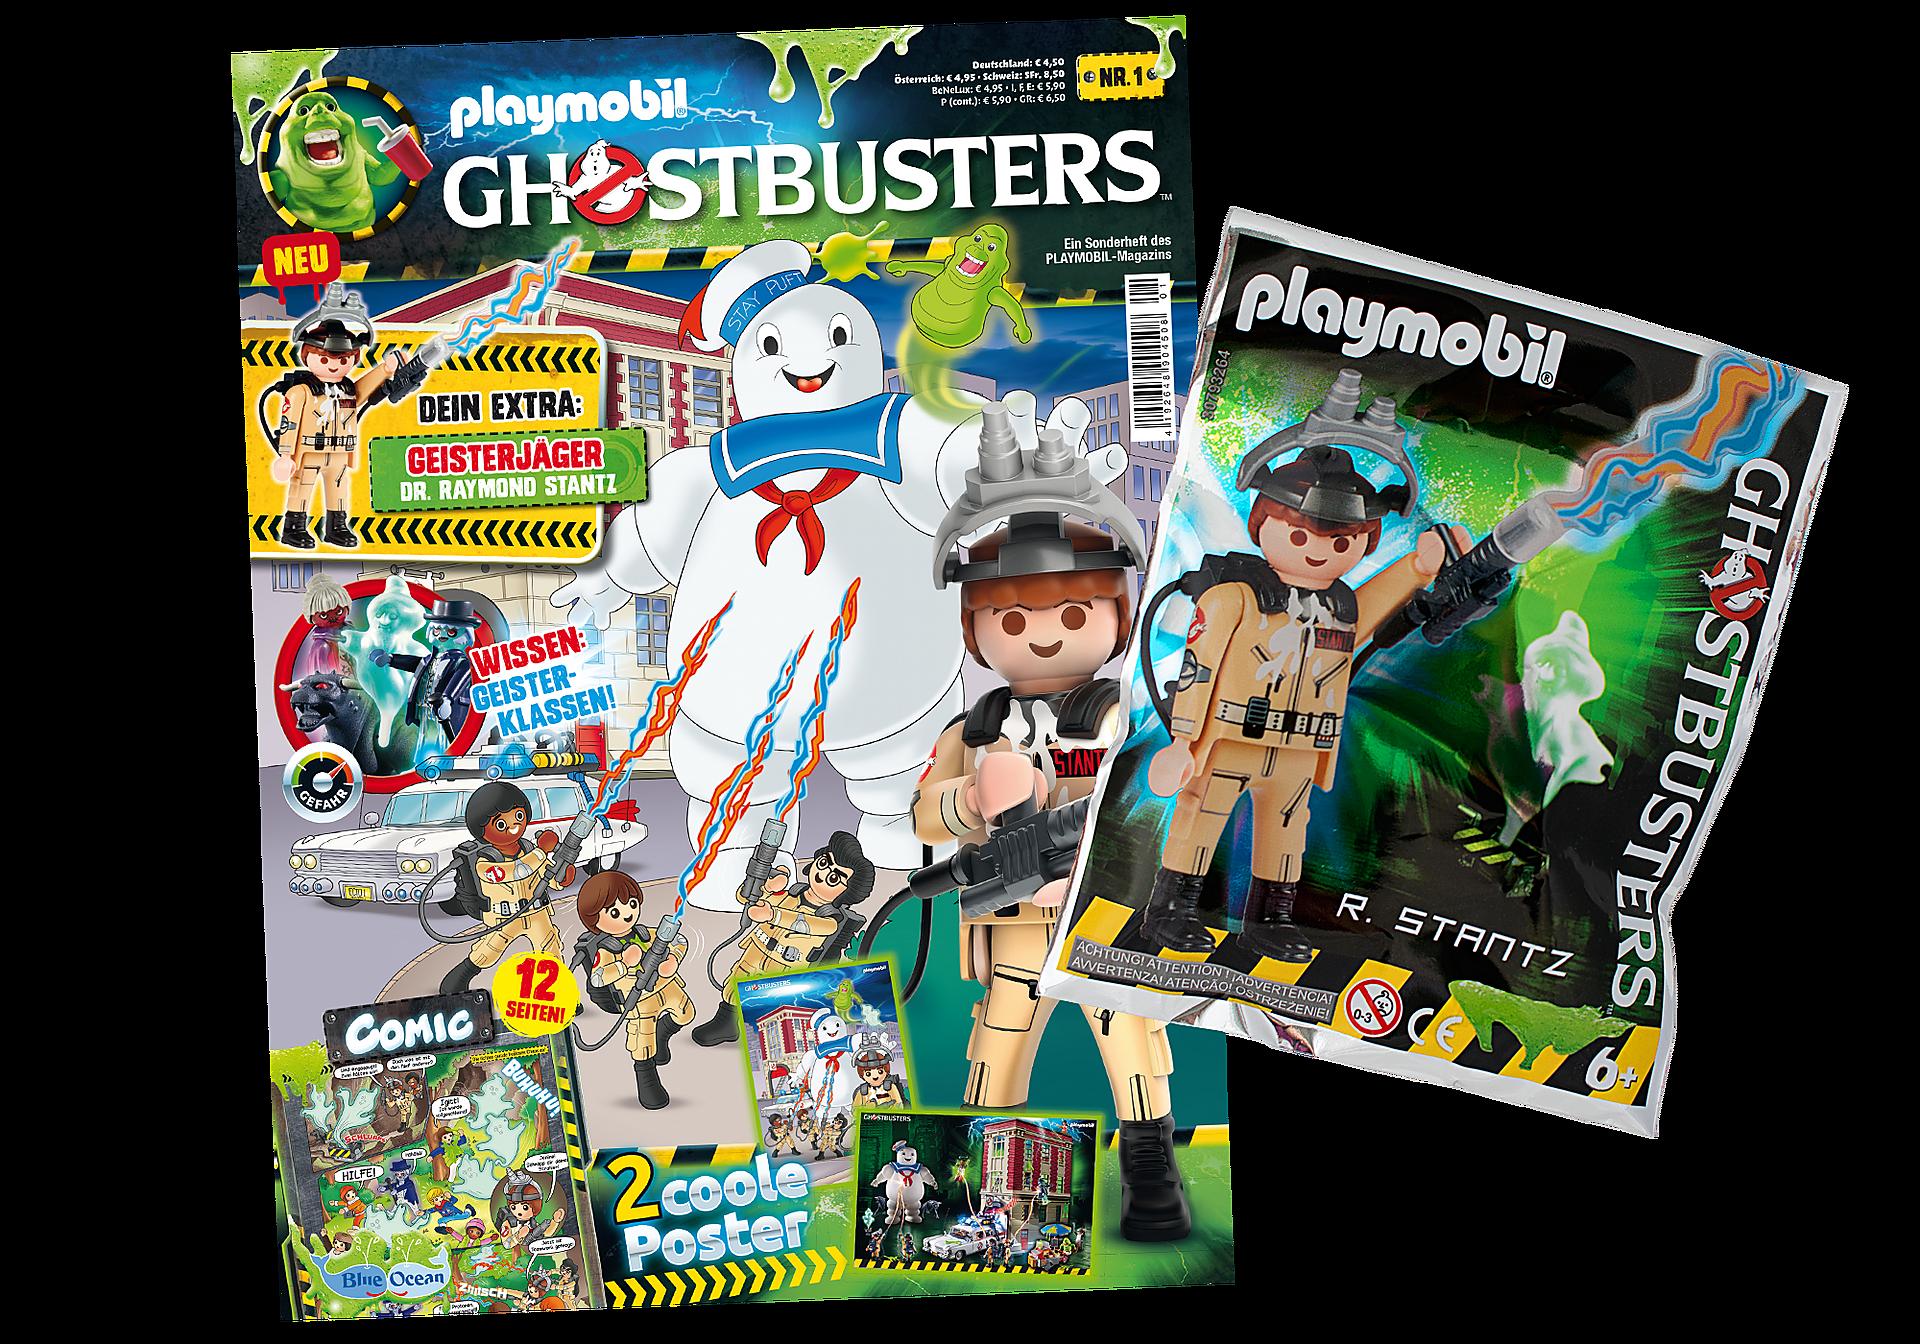 http://media.playmobil.com/i/playmobil/80628_product_detail/PLAYMOBIL-Magazin Sonderausgabe Ghostbusters 1/2019